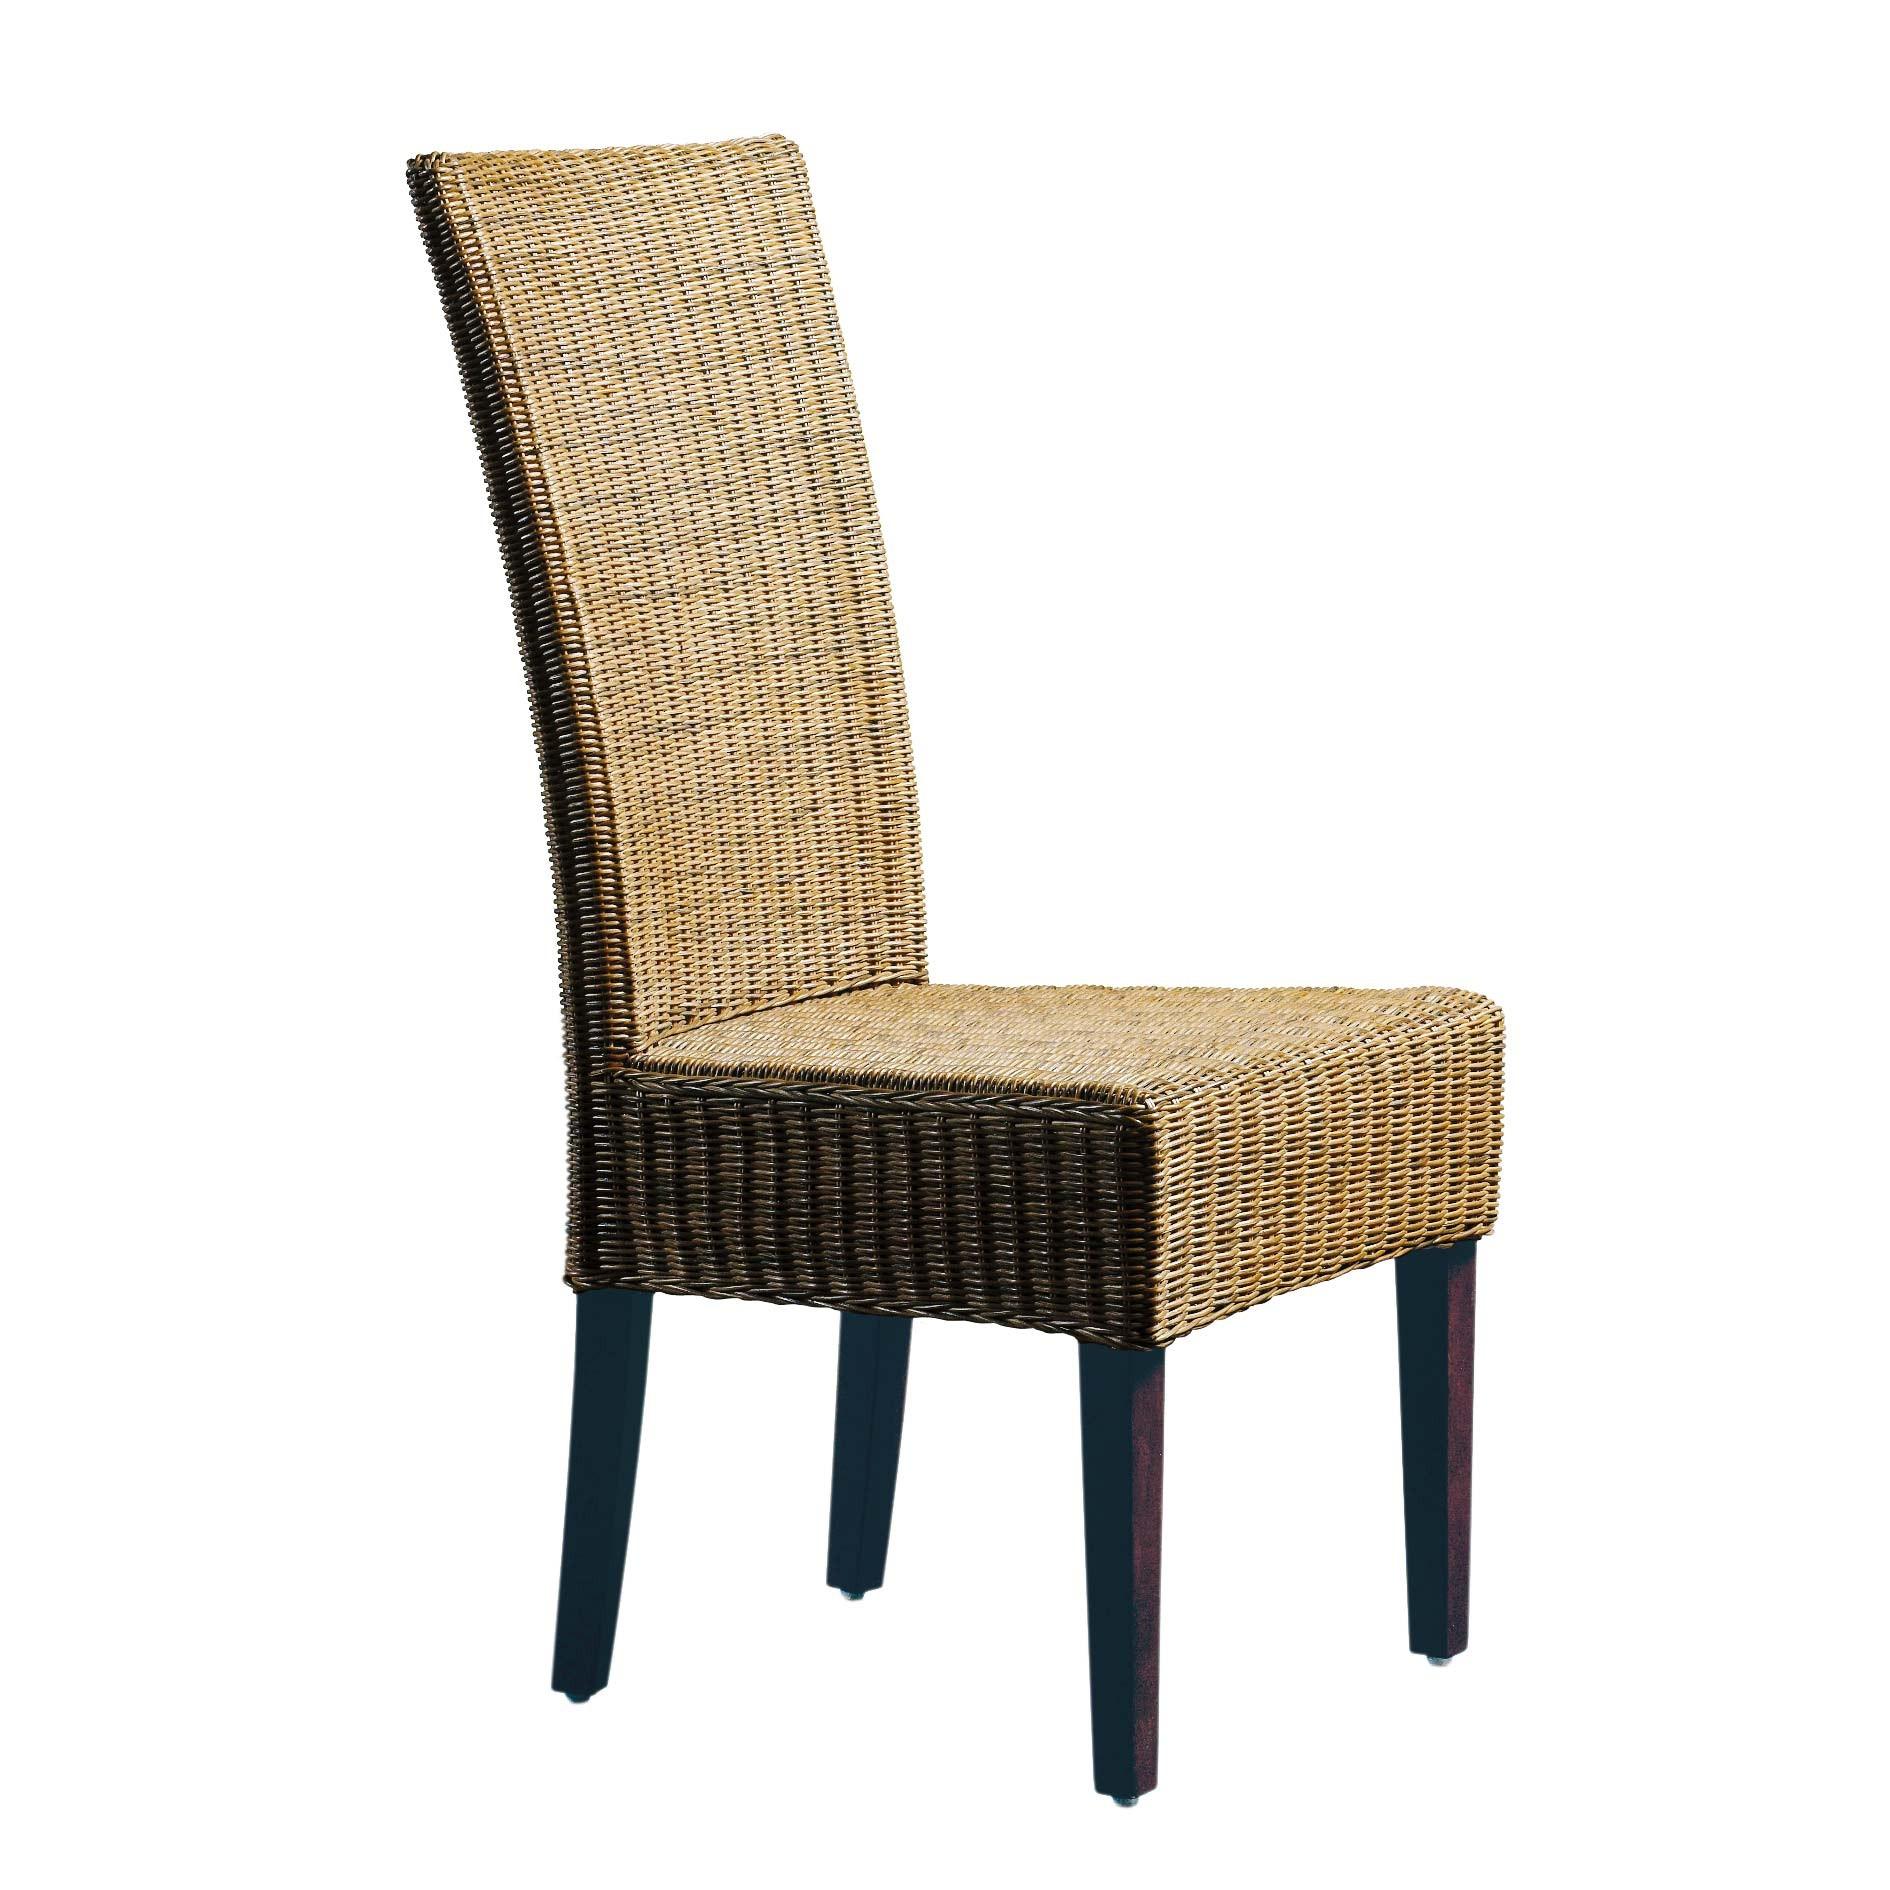 Muebles becara segunda mano obtenga ideas dise o de muebles para su hogar aqu - Sillas de peluqueria de segunda mano ...